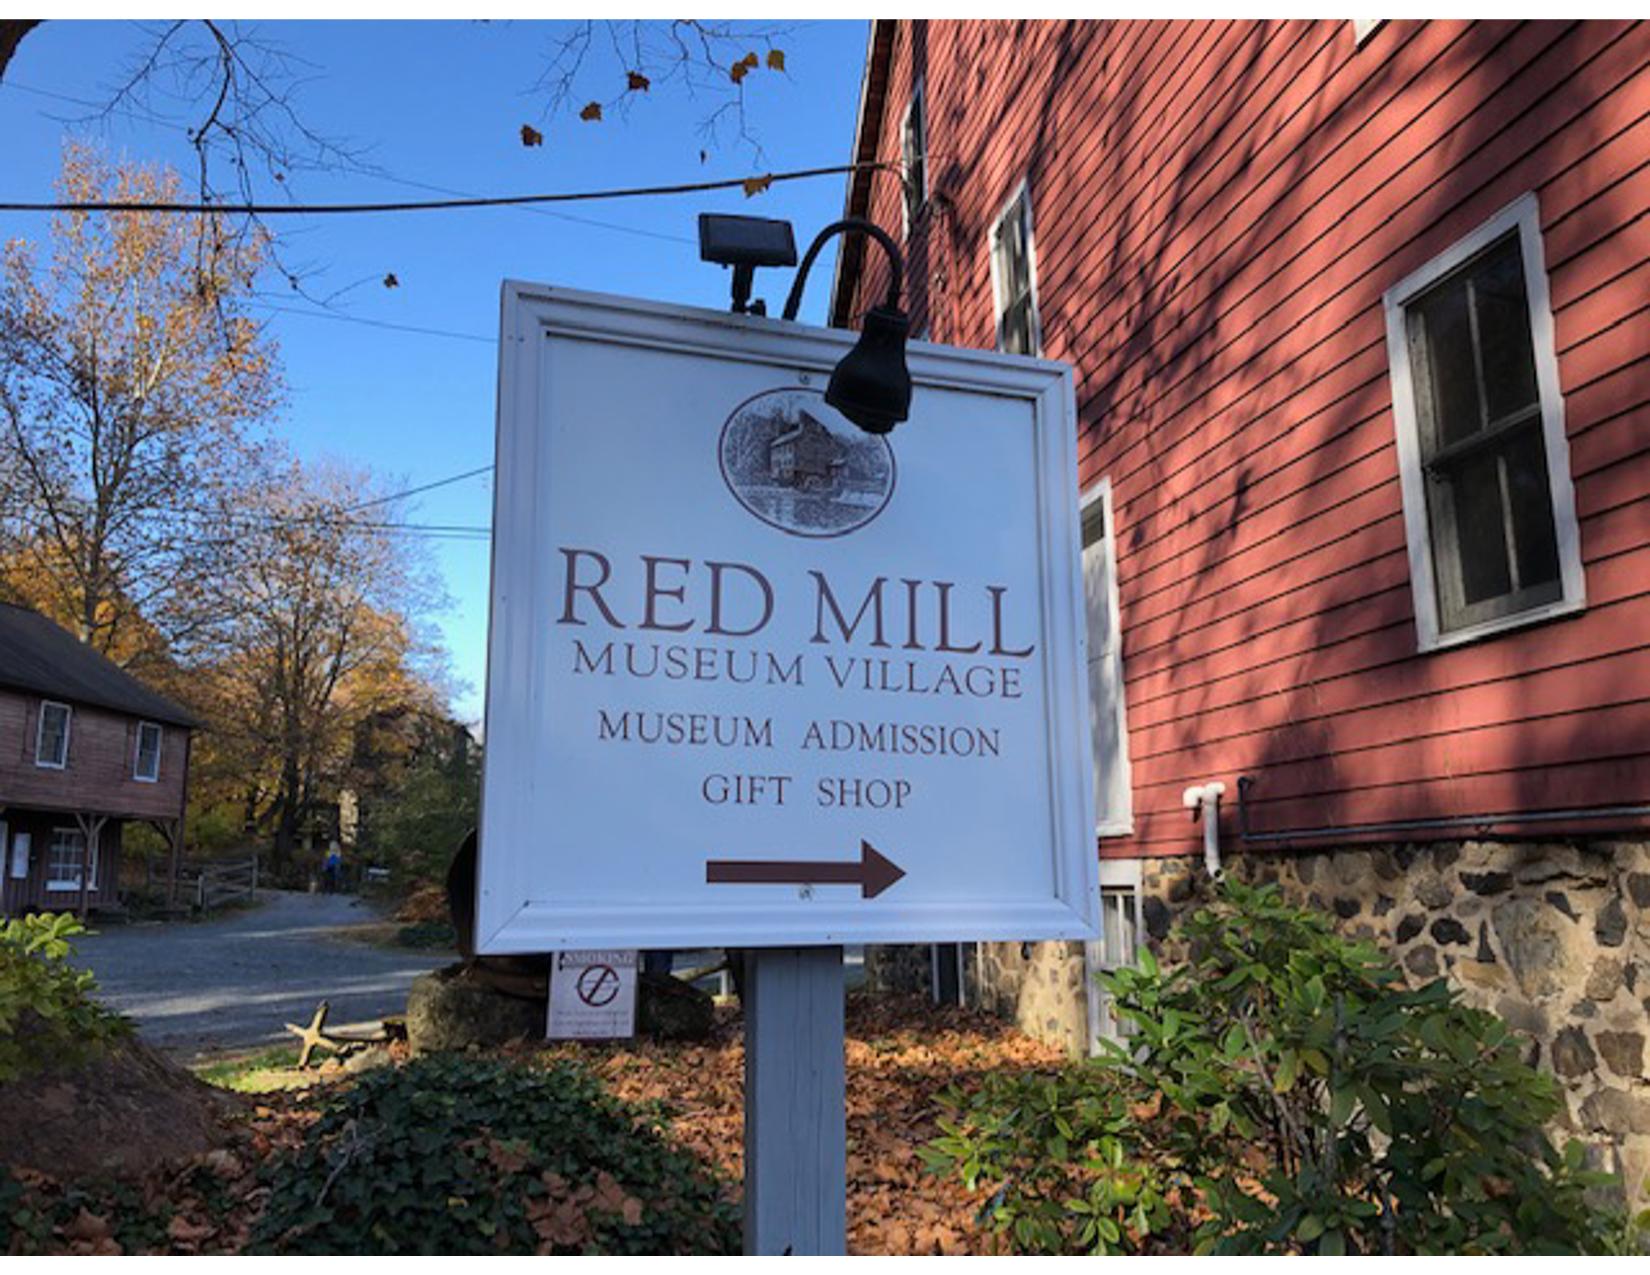 Red Mill Village New Jersey B-08